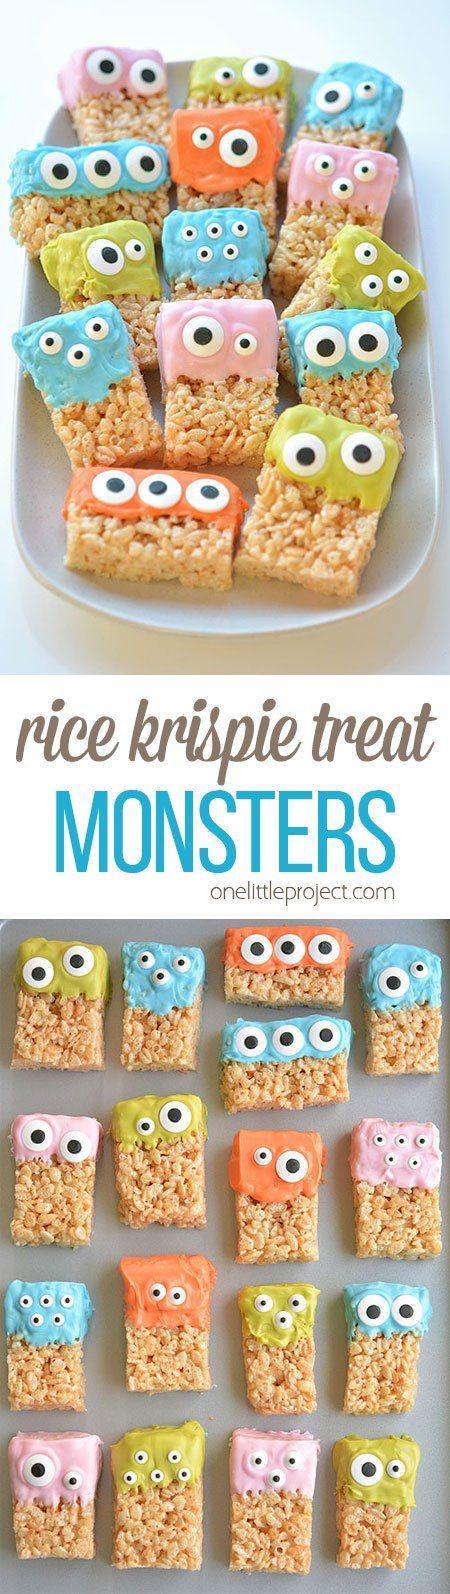 15+ Amazing Halloween Ideas Halloween treats for kids, Halloween